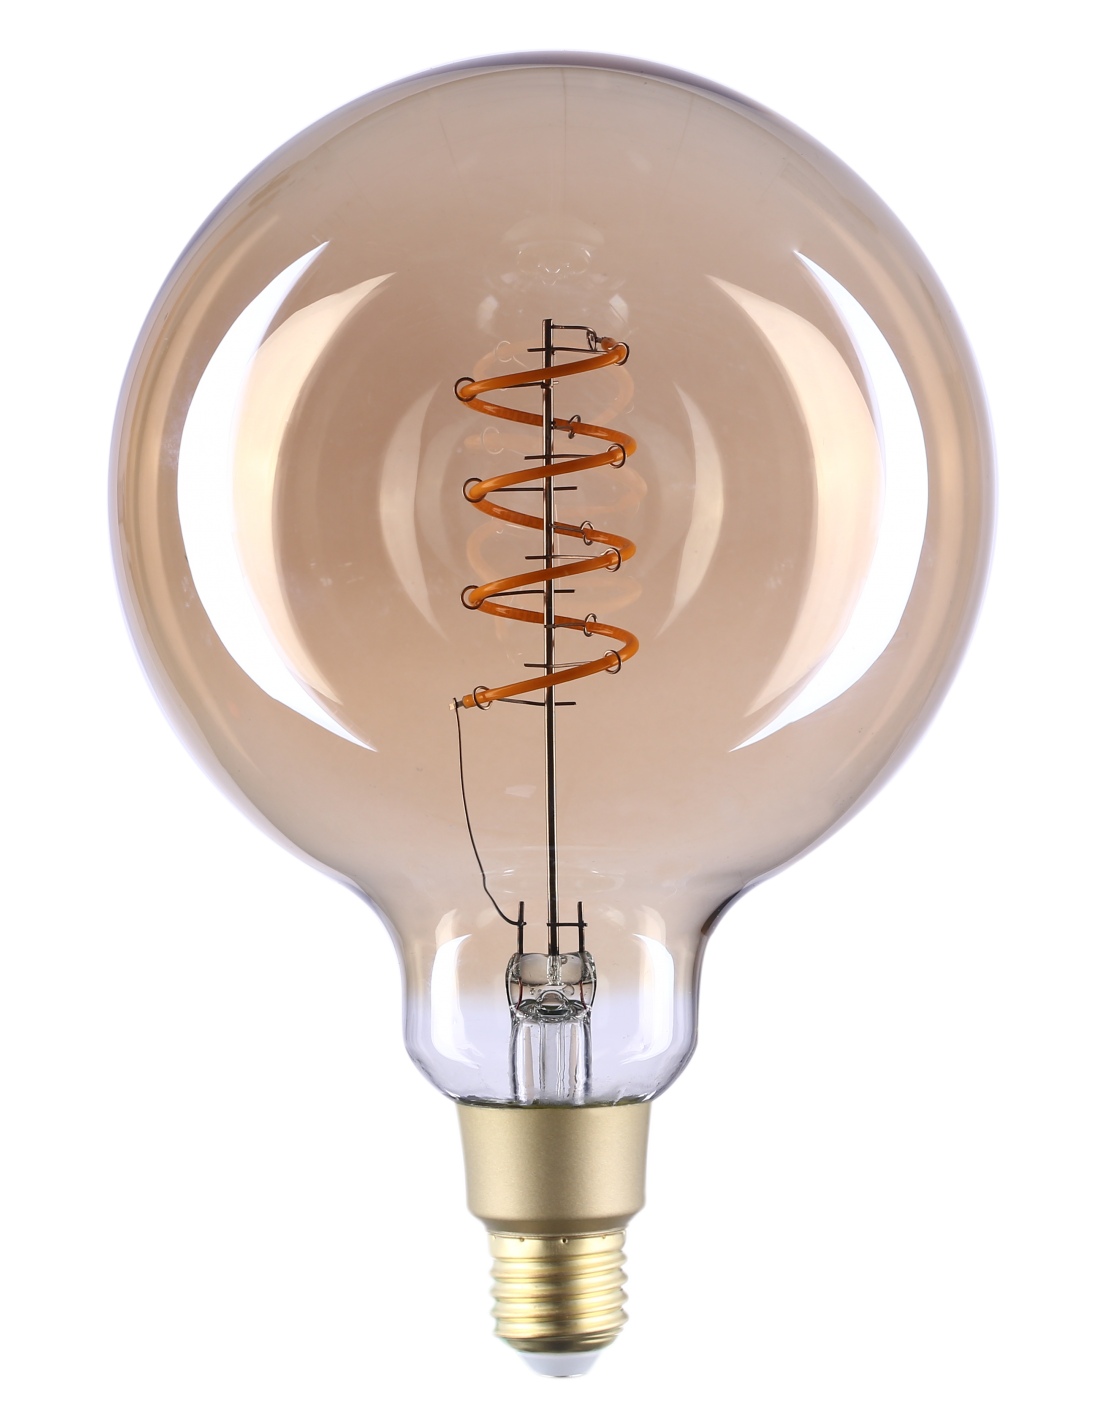 Lâmpada LED E27 G125 Filamento Smart Wi-Fi 4W Branco Q. 2700K 260Lm - Shelly Vintage G125